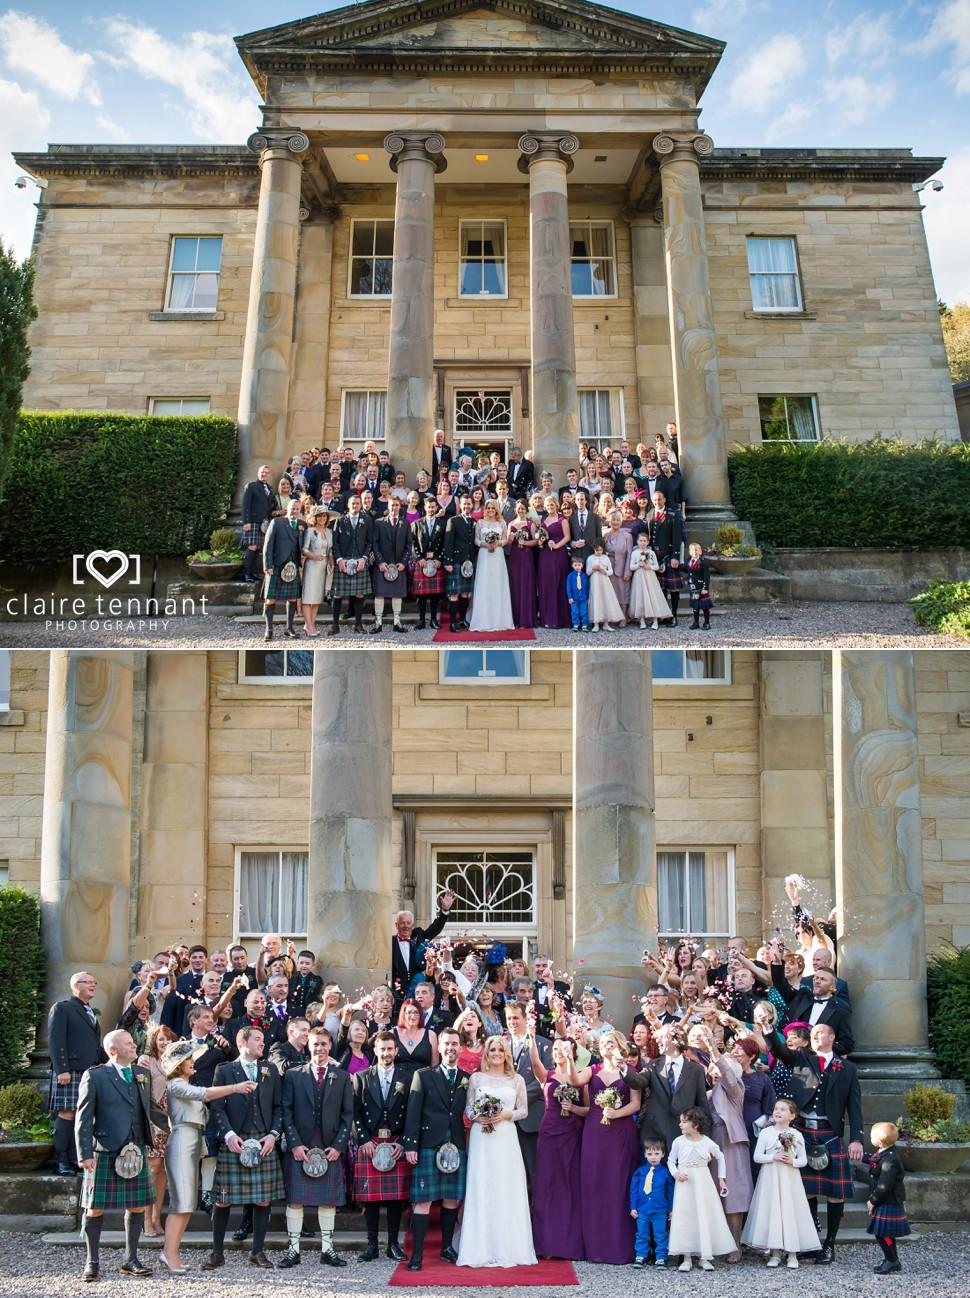 Balbirnie House Group Photo